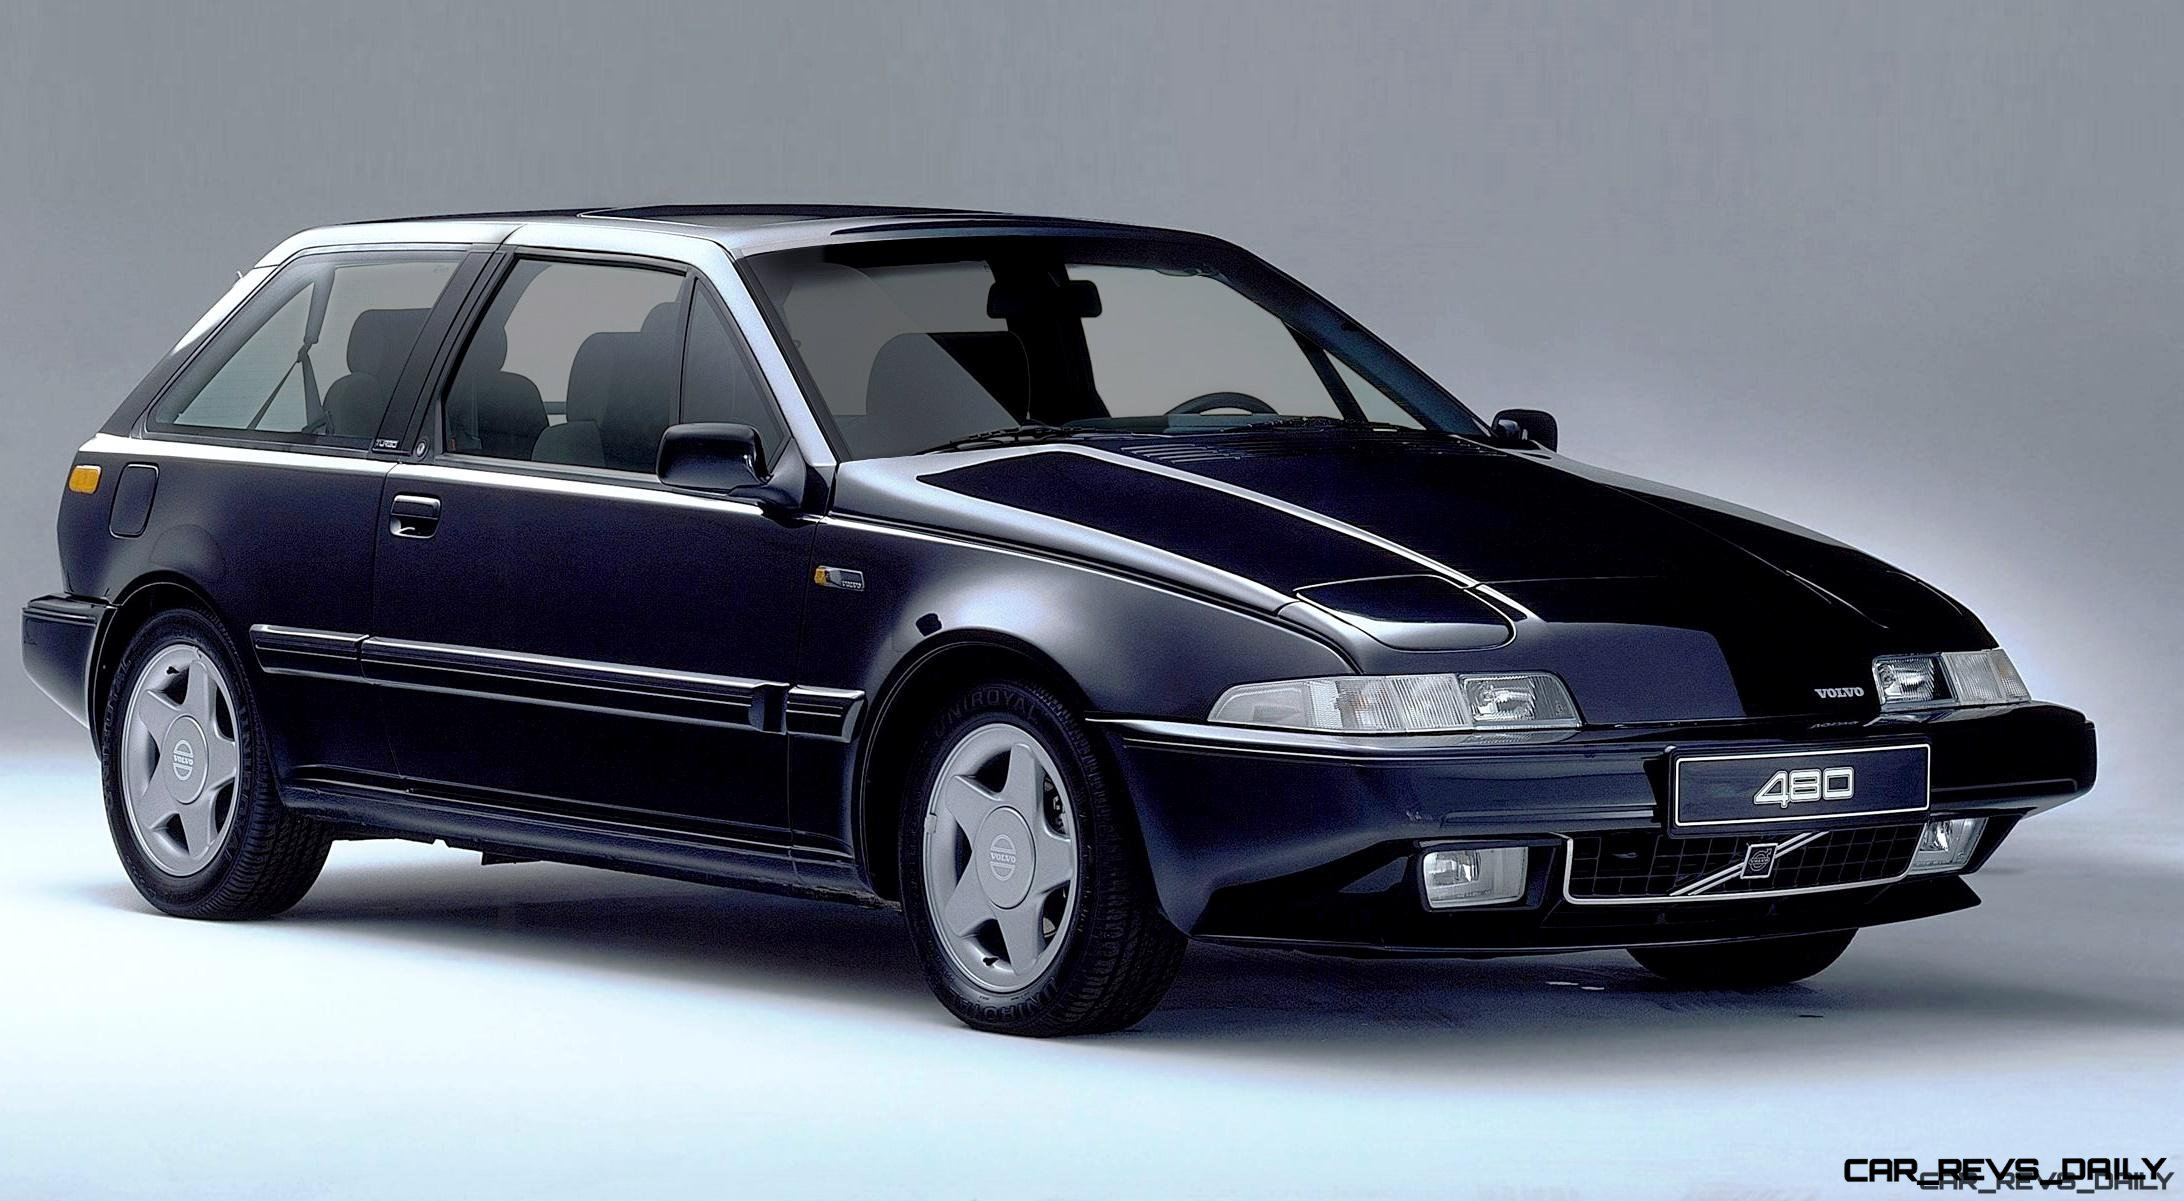 6347_Volvo_480_Turbo